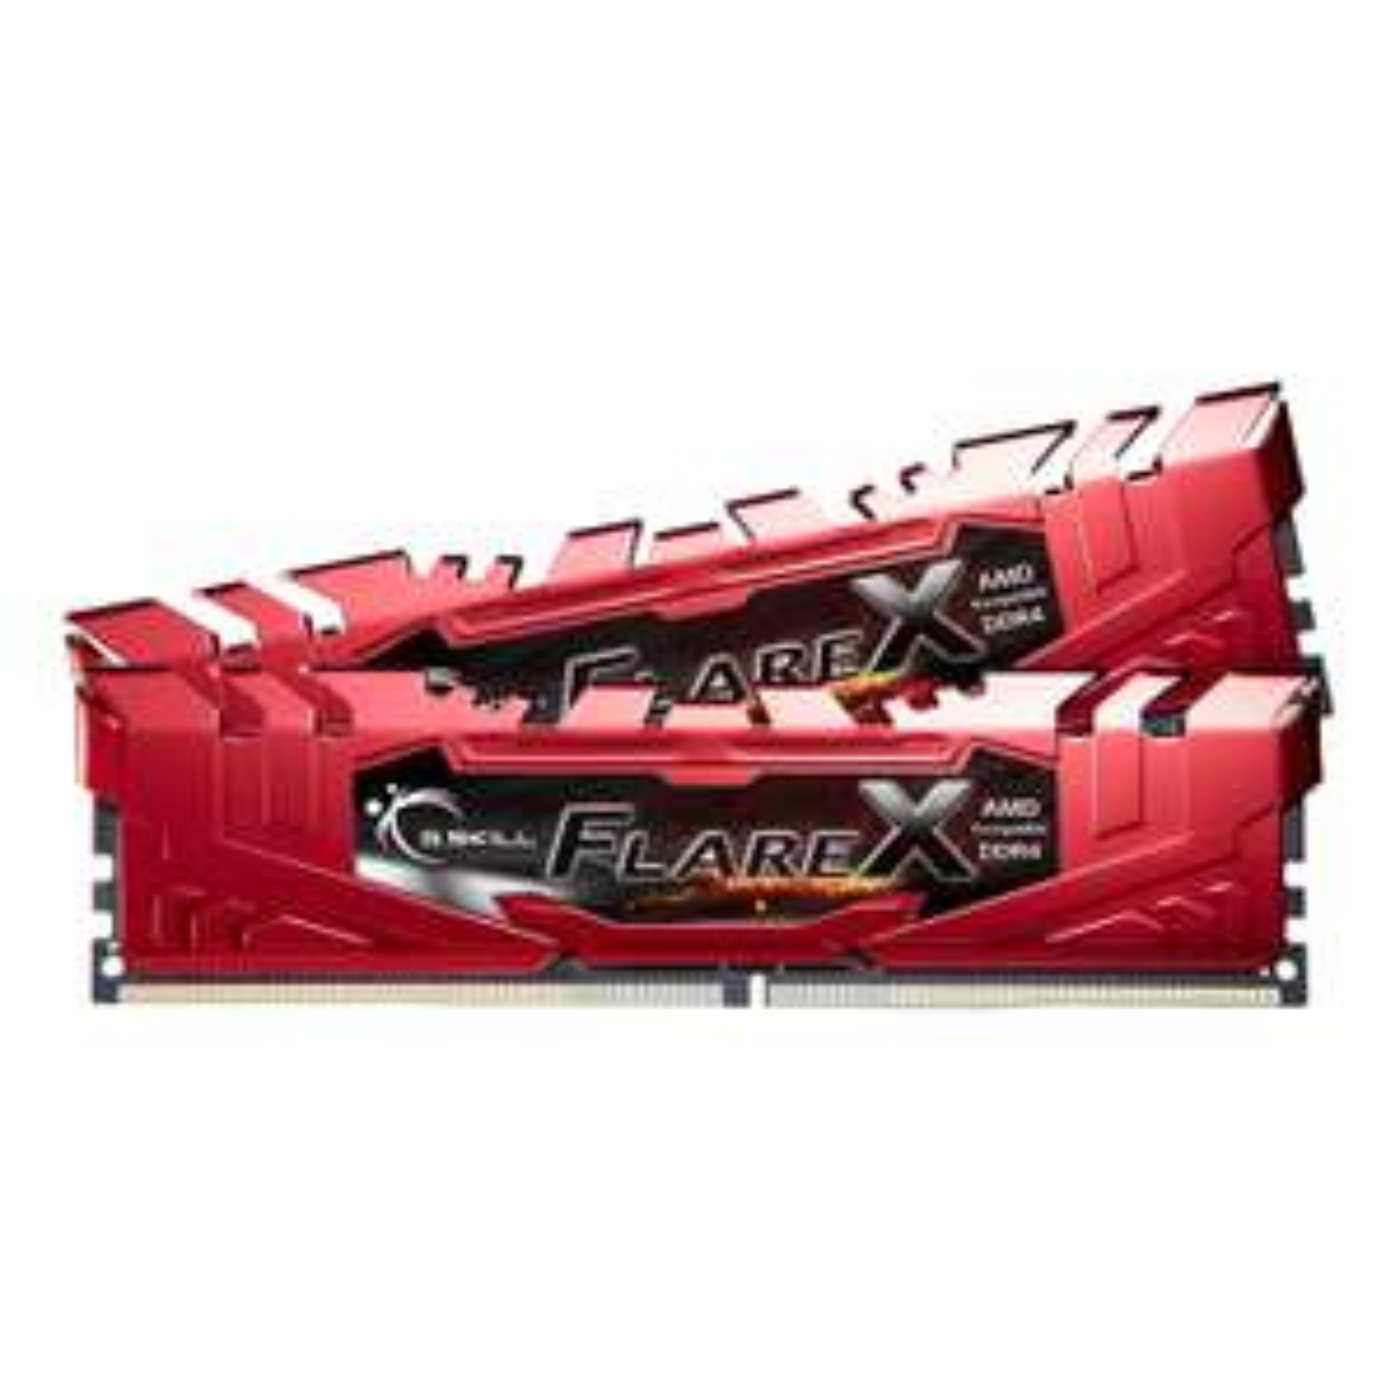 G.SKILL- Flare X 2 x 8 Go DDR4 2400 Mhz PC4-19200 1.2V rouge pour AMD Ryzen